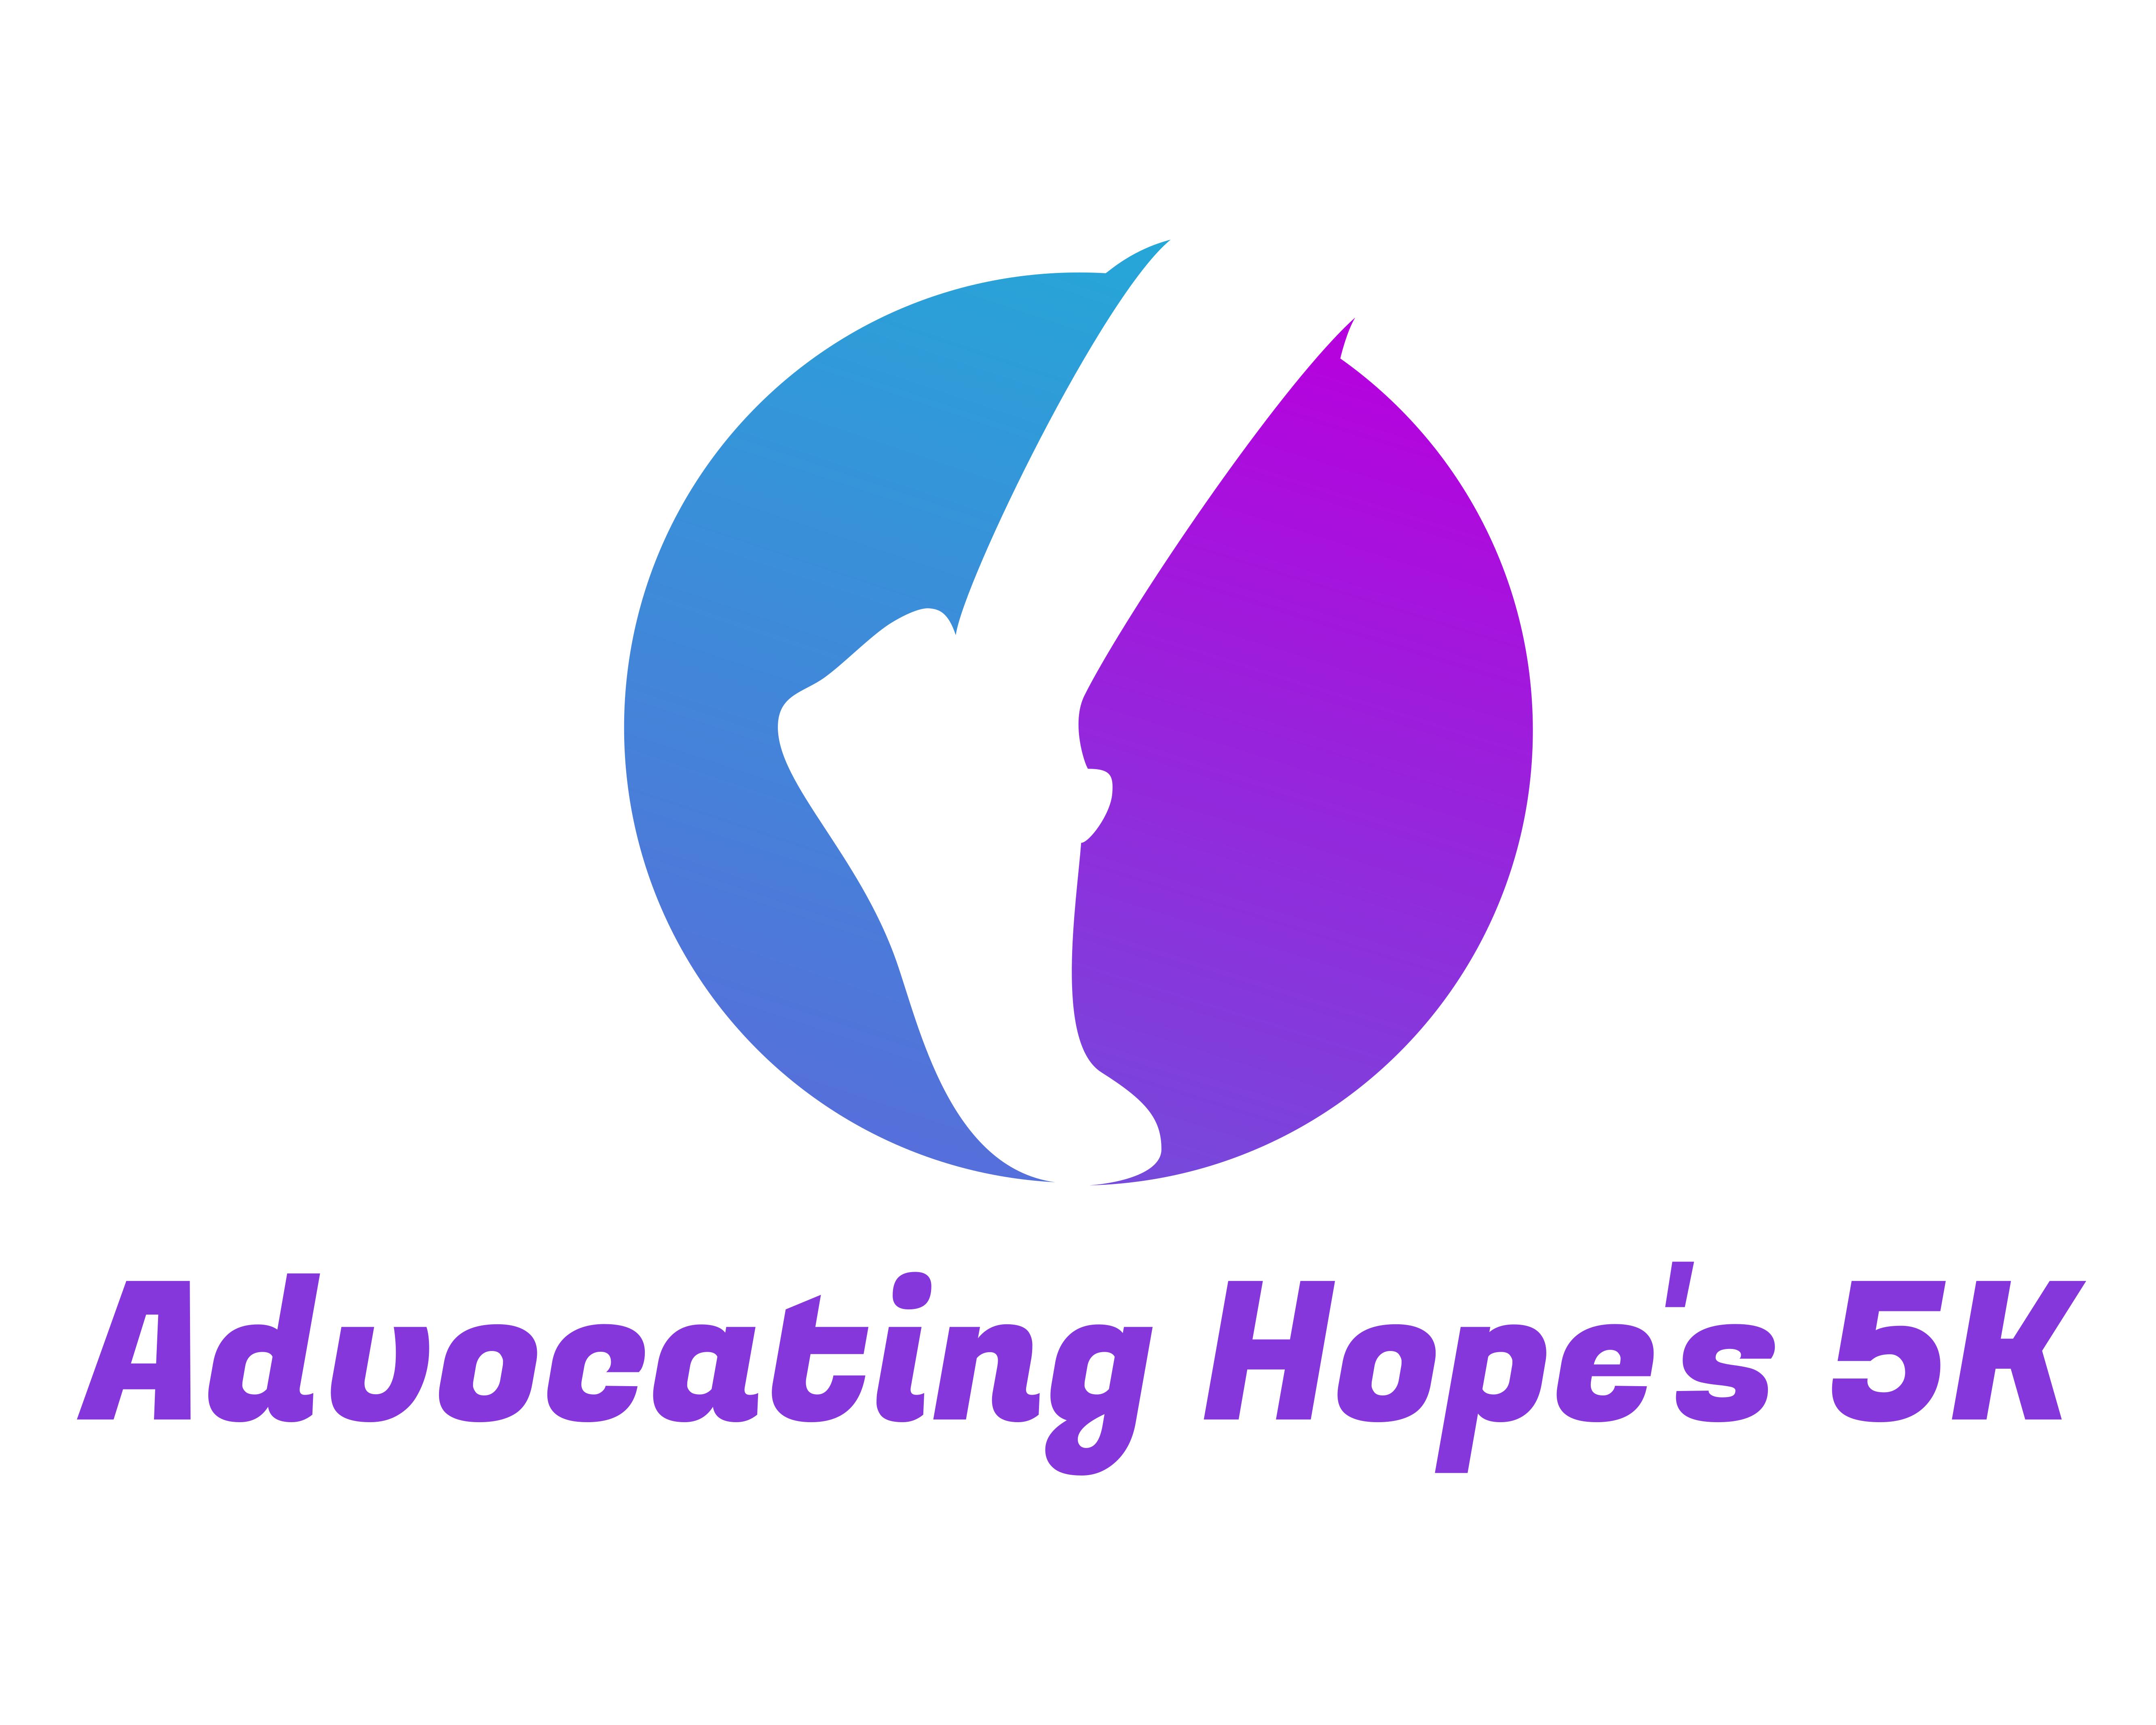 Advocating Hope's 5K Run/Walk at Joseph T. St. Lawrence Community Ctr